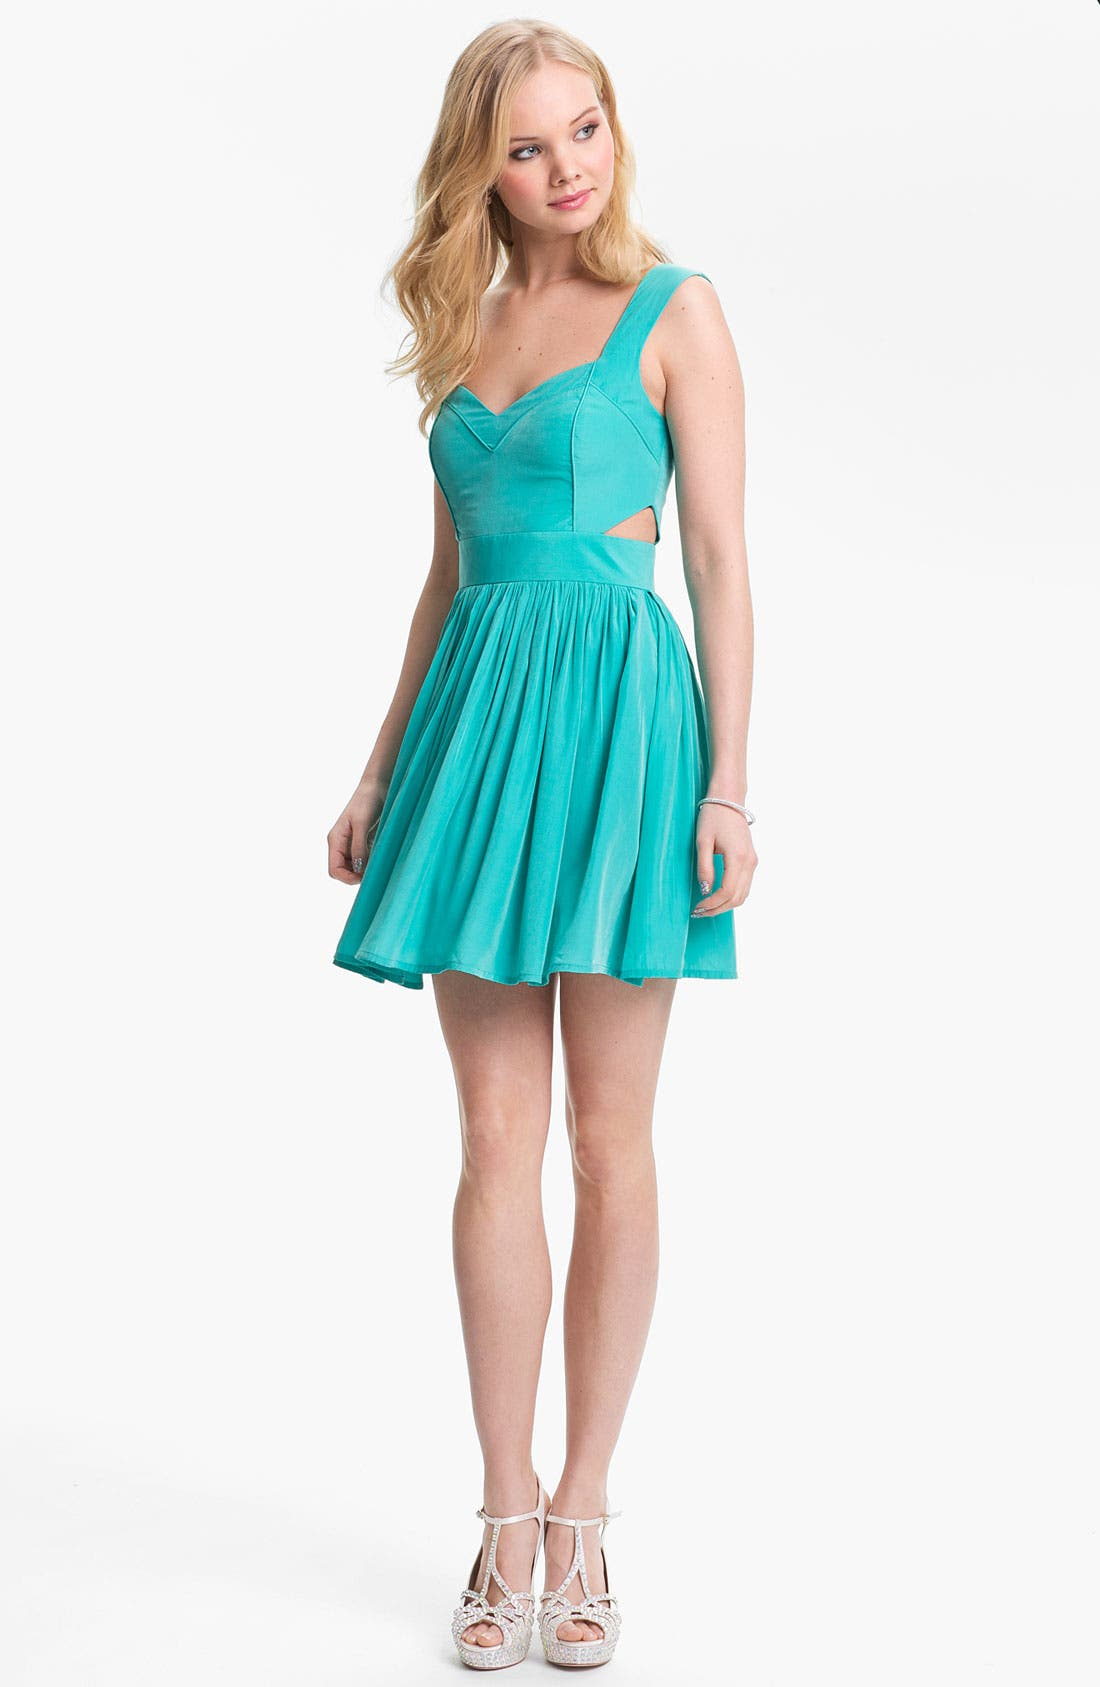 Alternate Image 1 Selected - Keepsake the Label Side Cutout Fit & Flare Dress